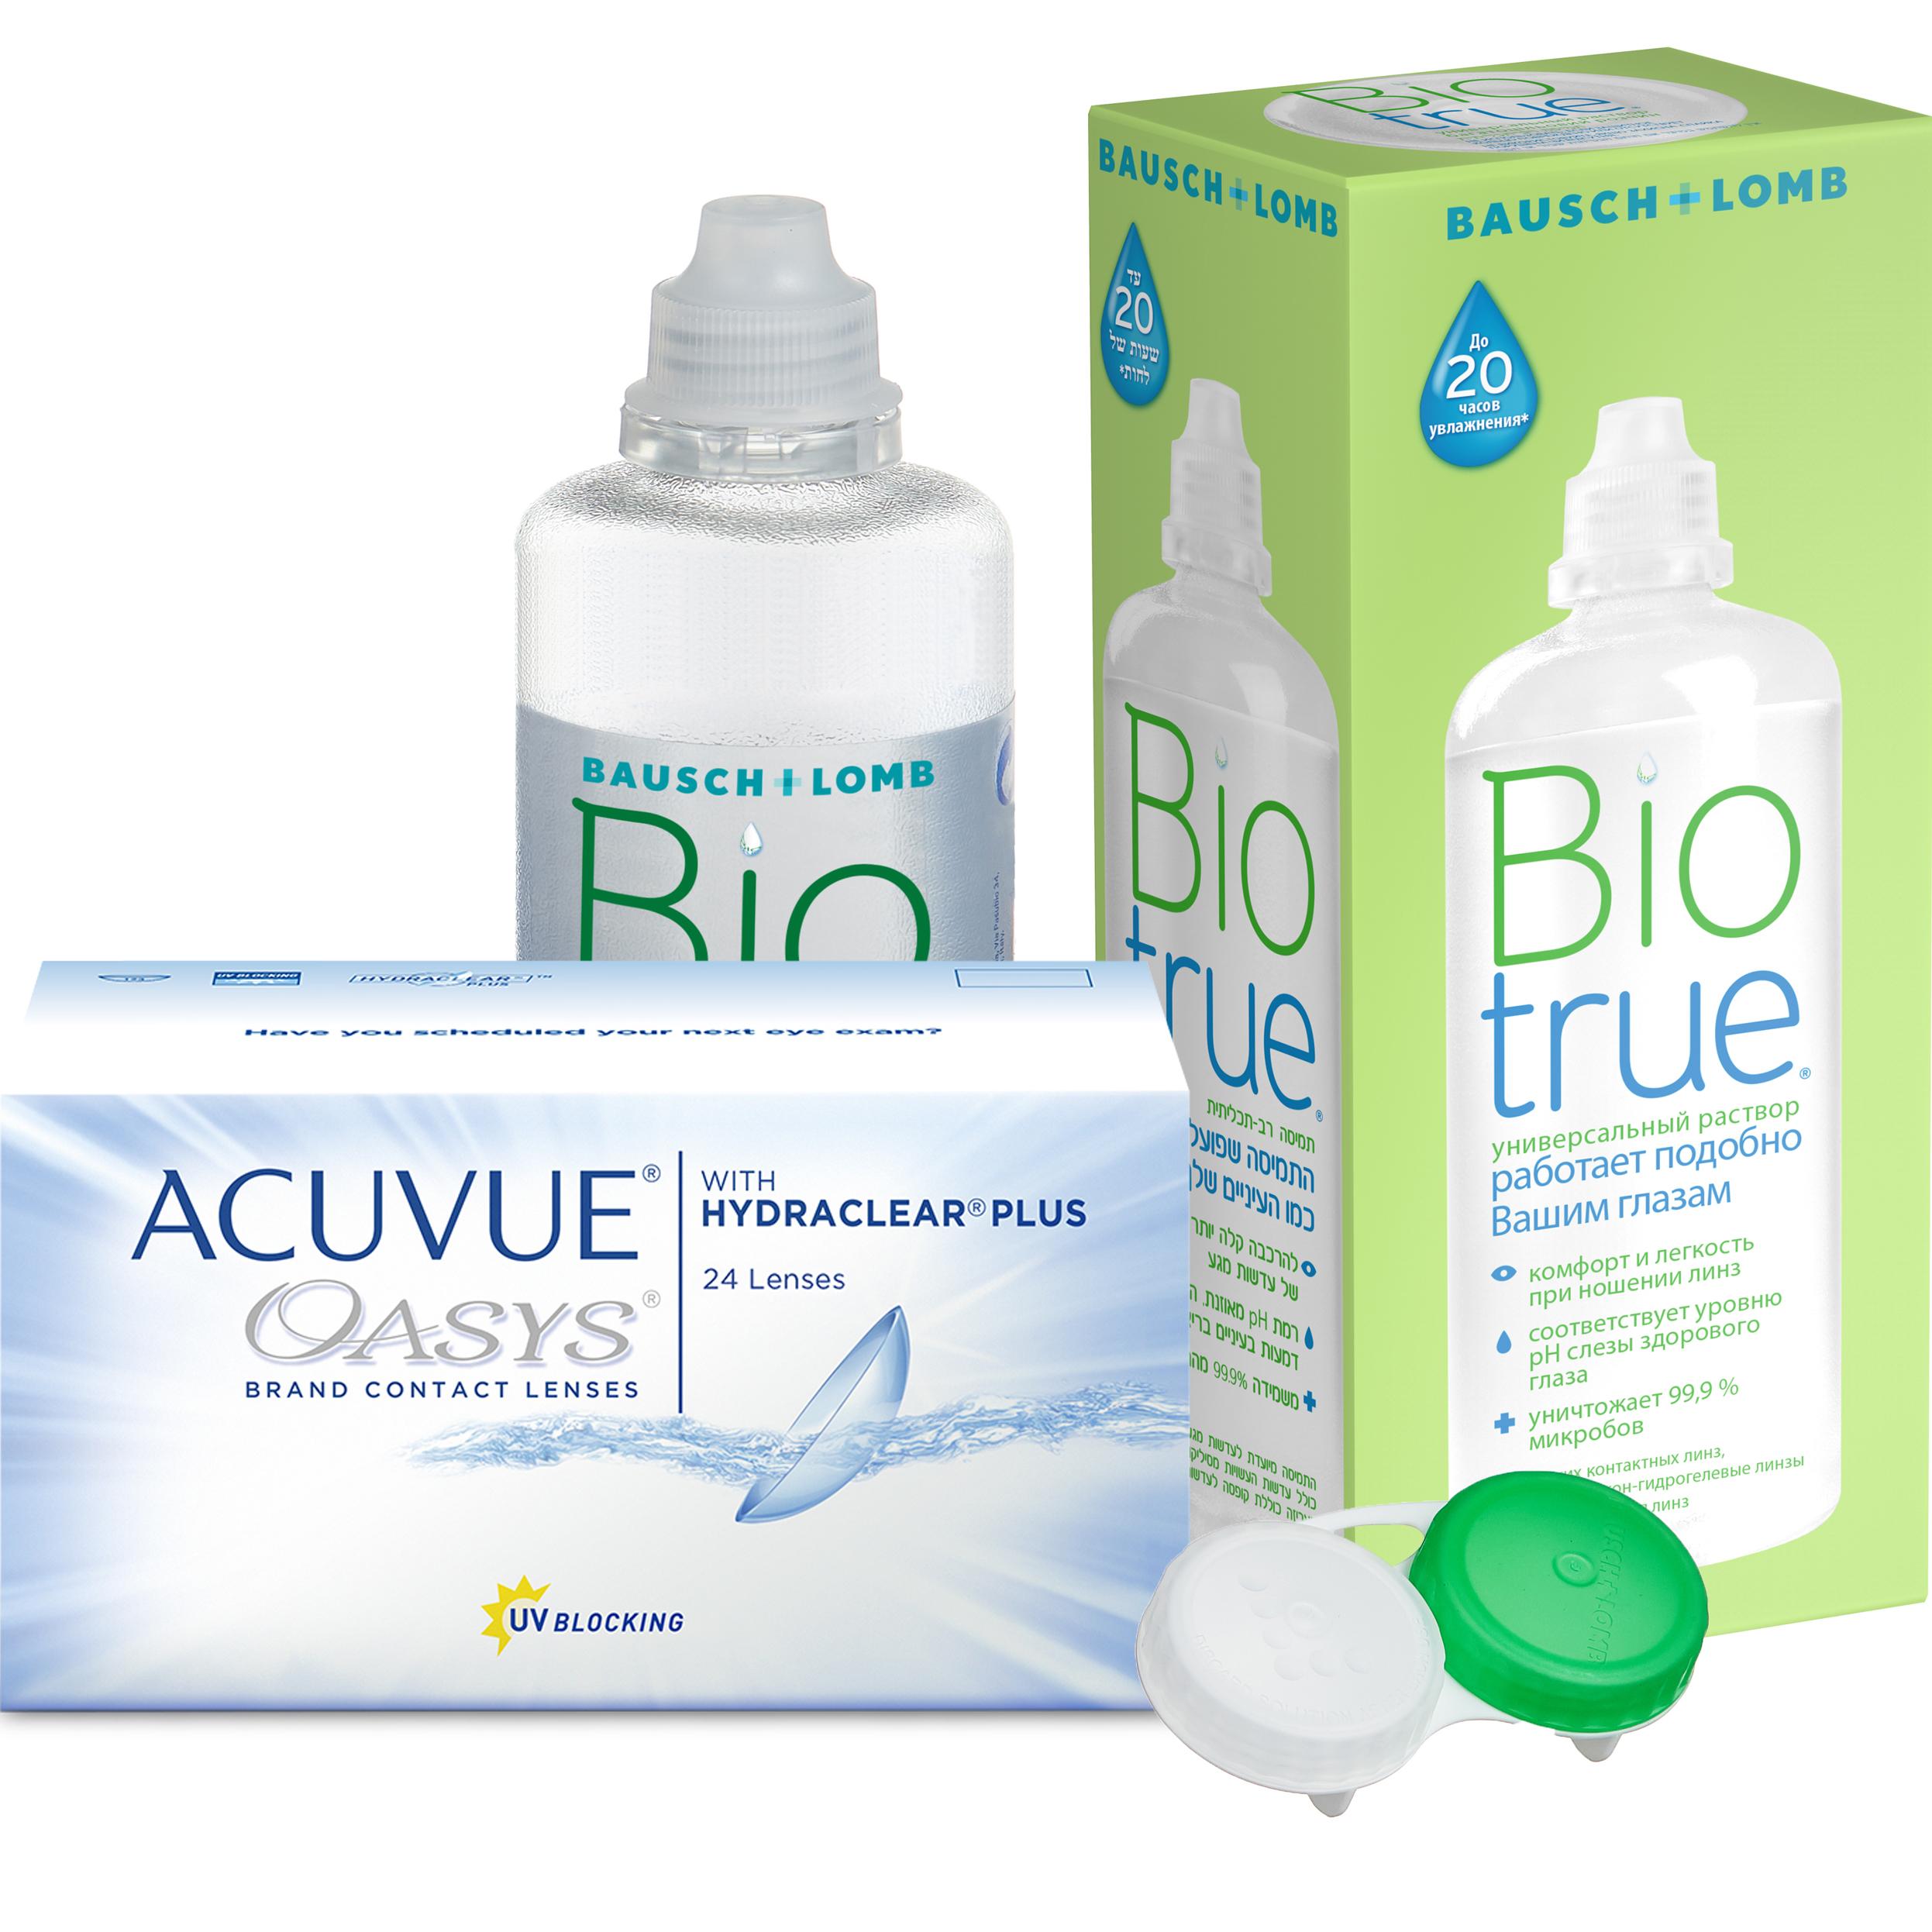 Купить Oasys with Hydraclear Plus 24 линзы + Biotrue, Контактные линзы Acuvue Oasys with Hydraclear Plus 24 линзы R 8.8 -6, 00 + Biotrue 300 мл